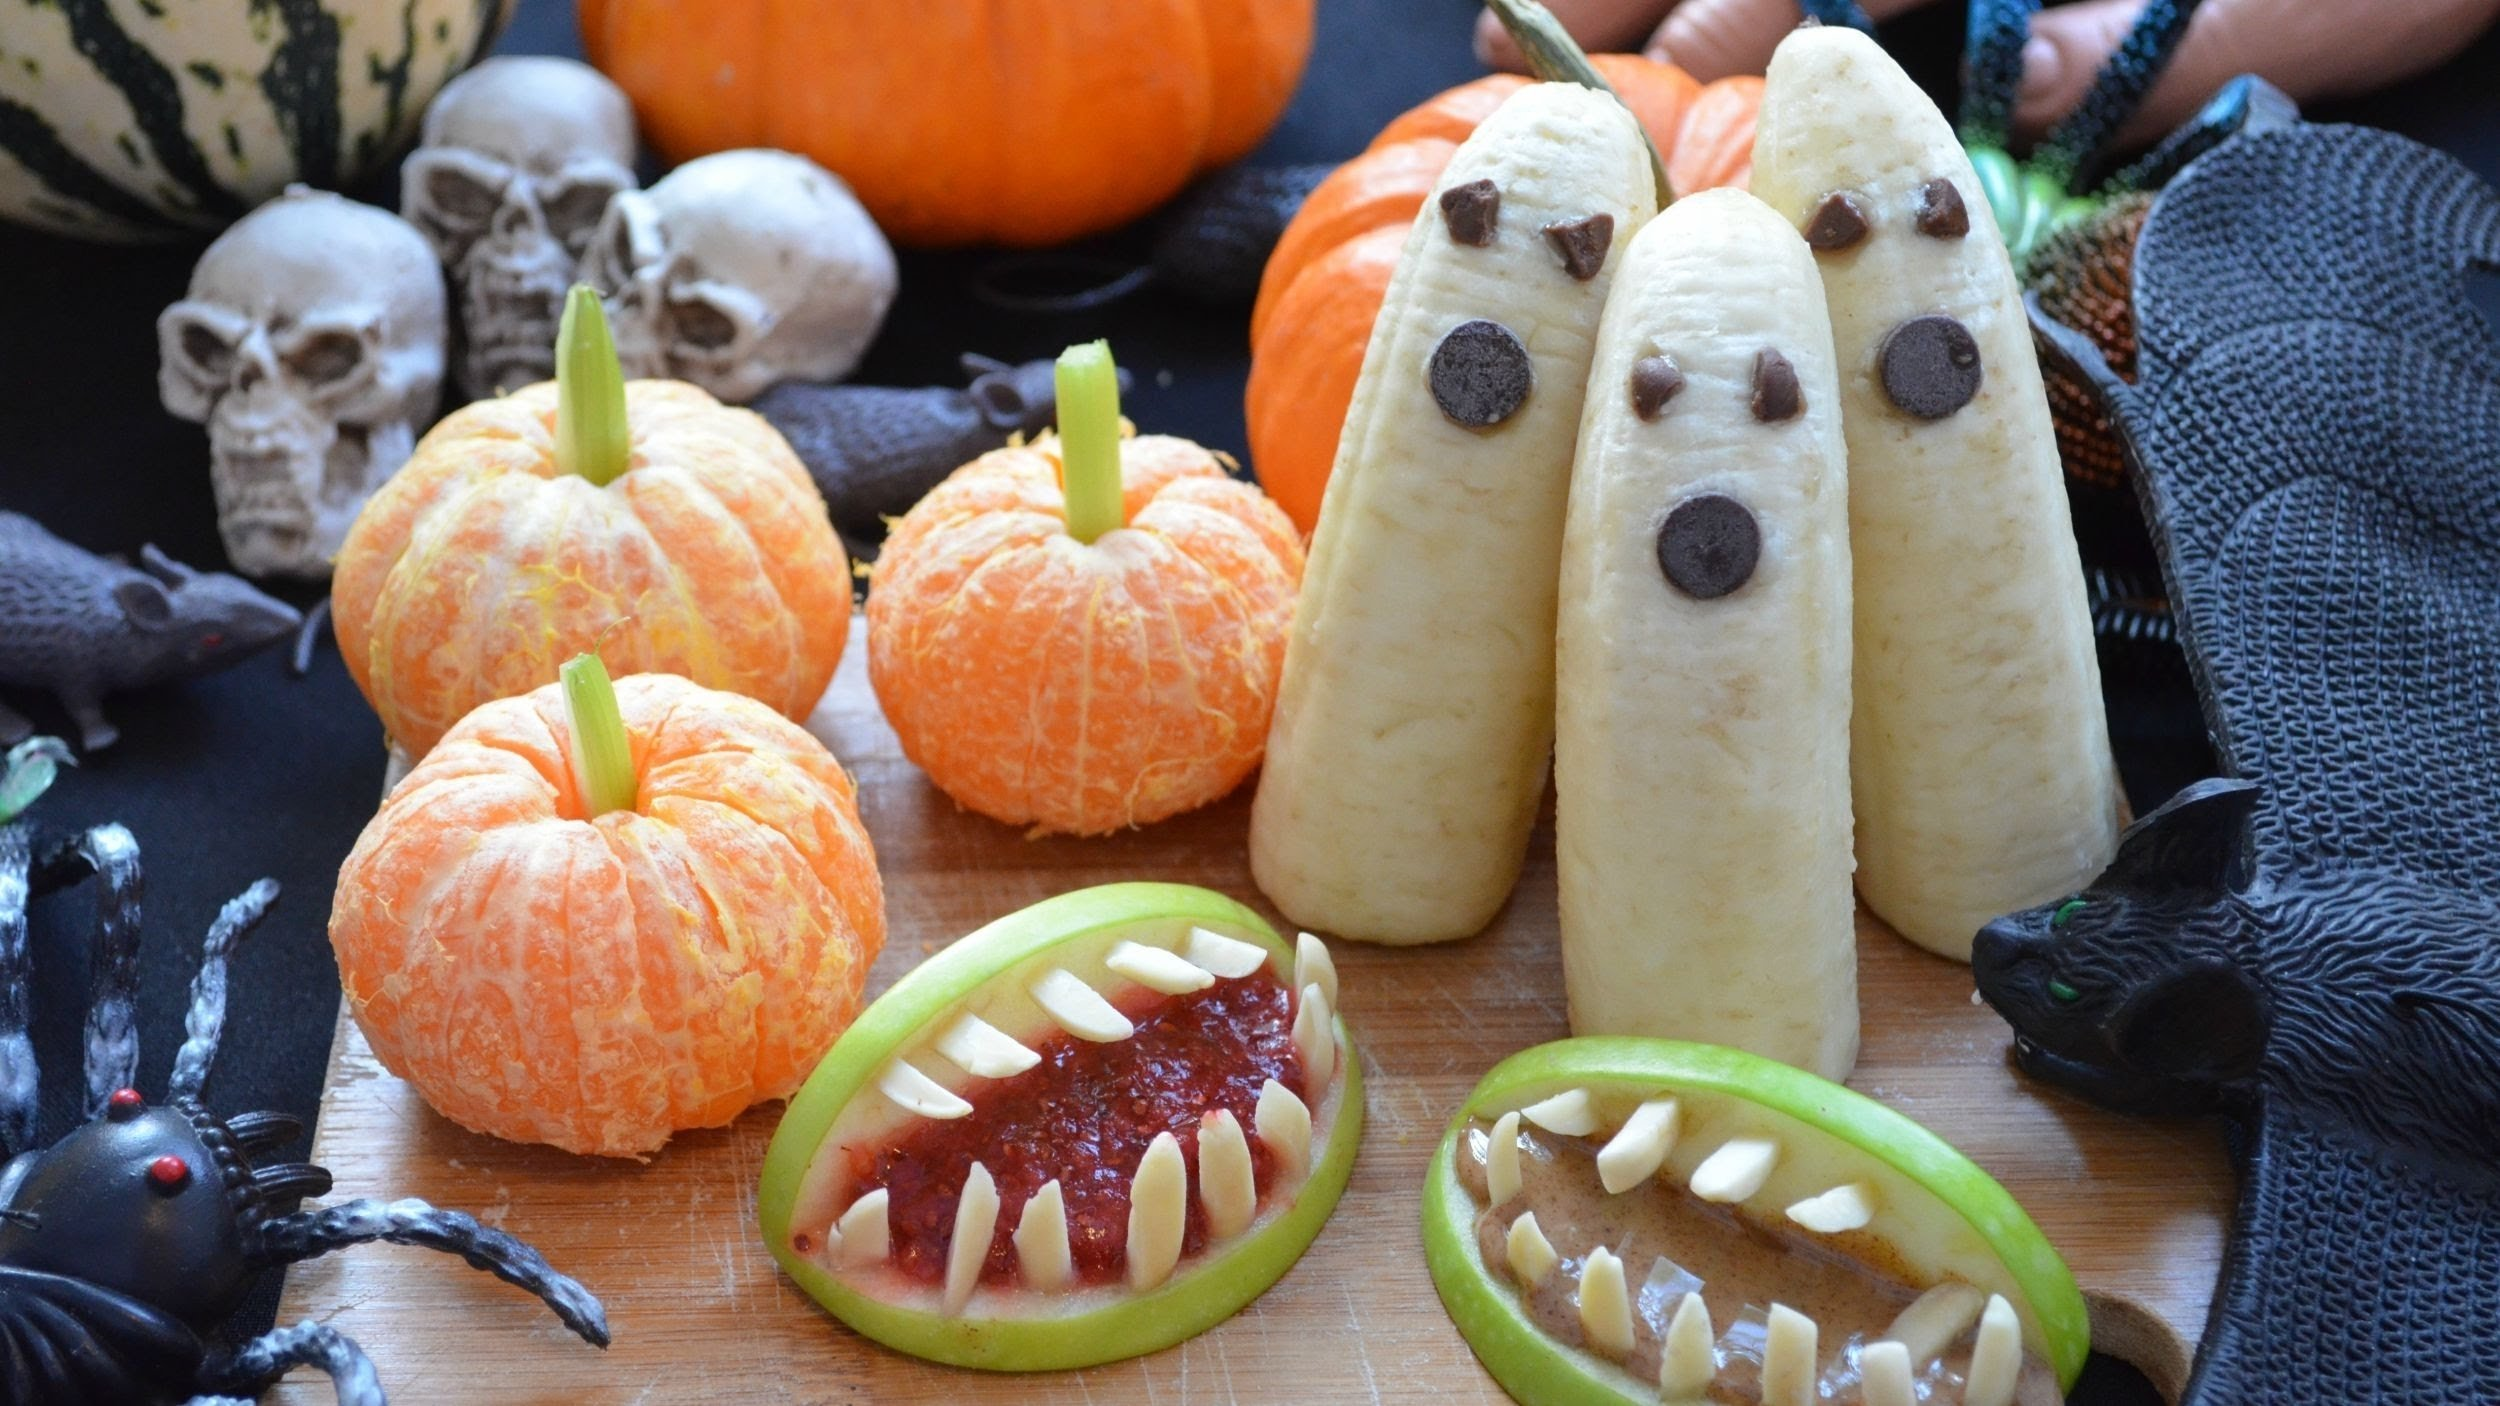 10 Cute Halloween Treat Ideas For Kids easy diy halloween treats fablunch youtube 2020